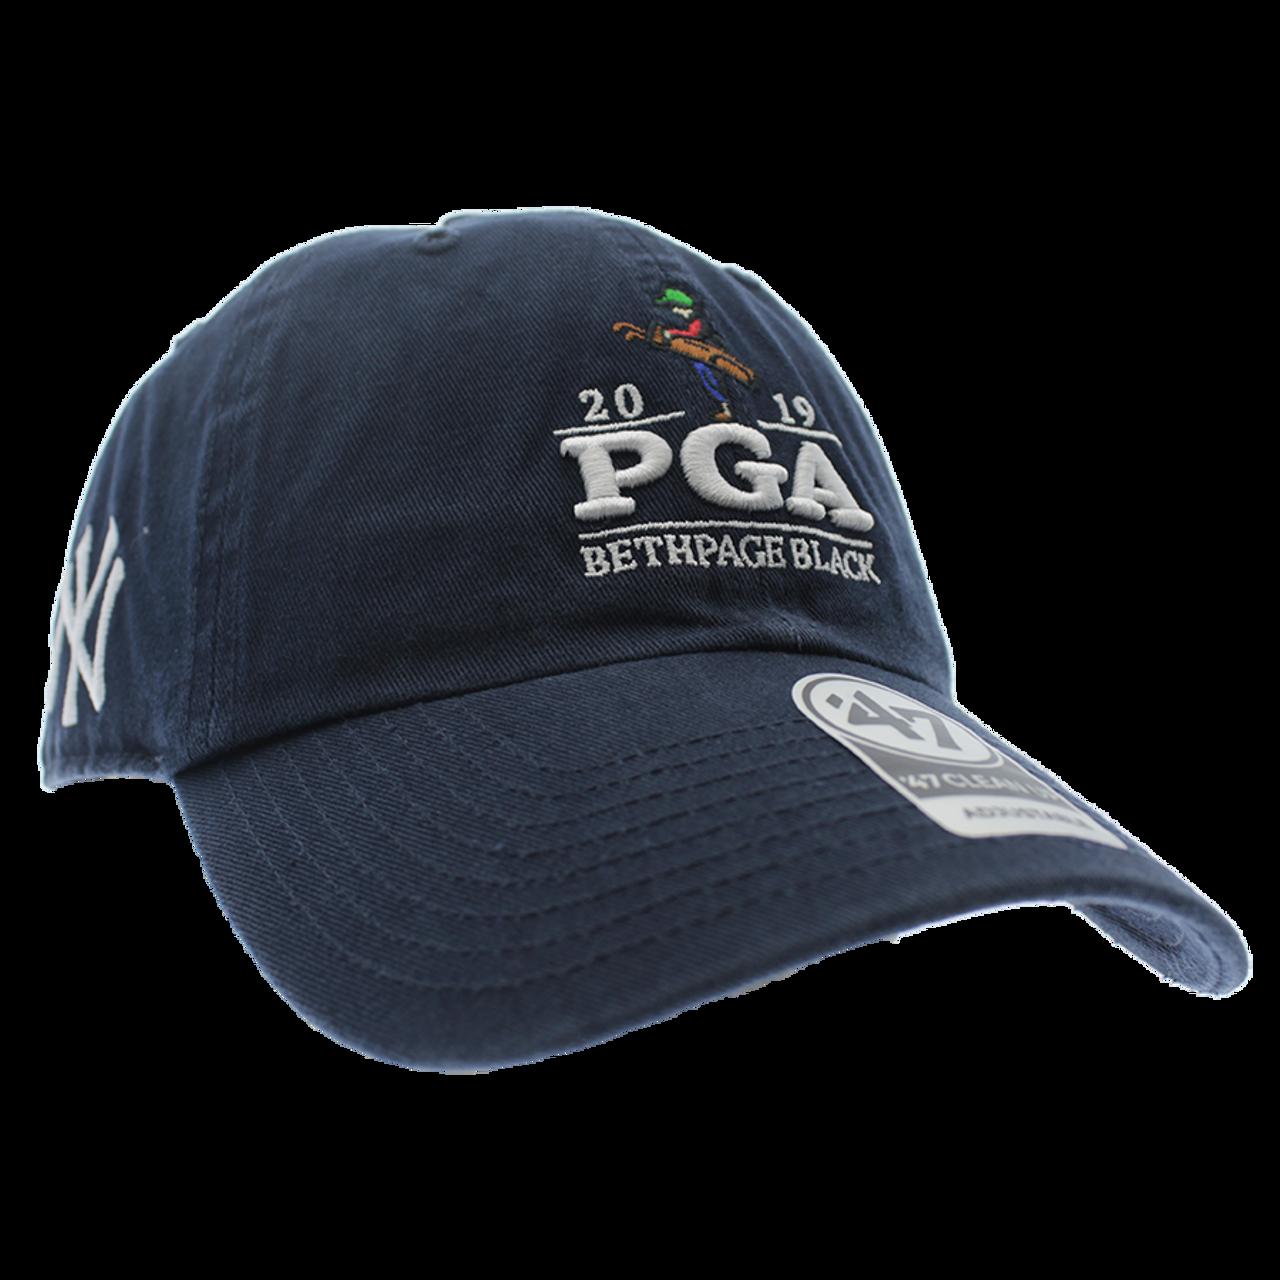 ea9b8c32 New York Yankees & 2019 PGA Navy Baseball Cap- 47' Brand